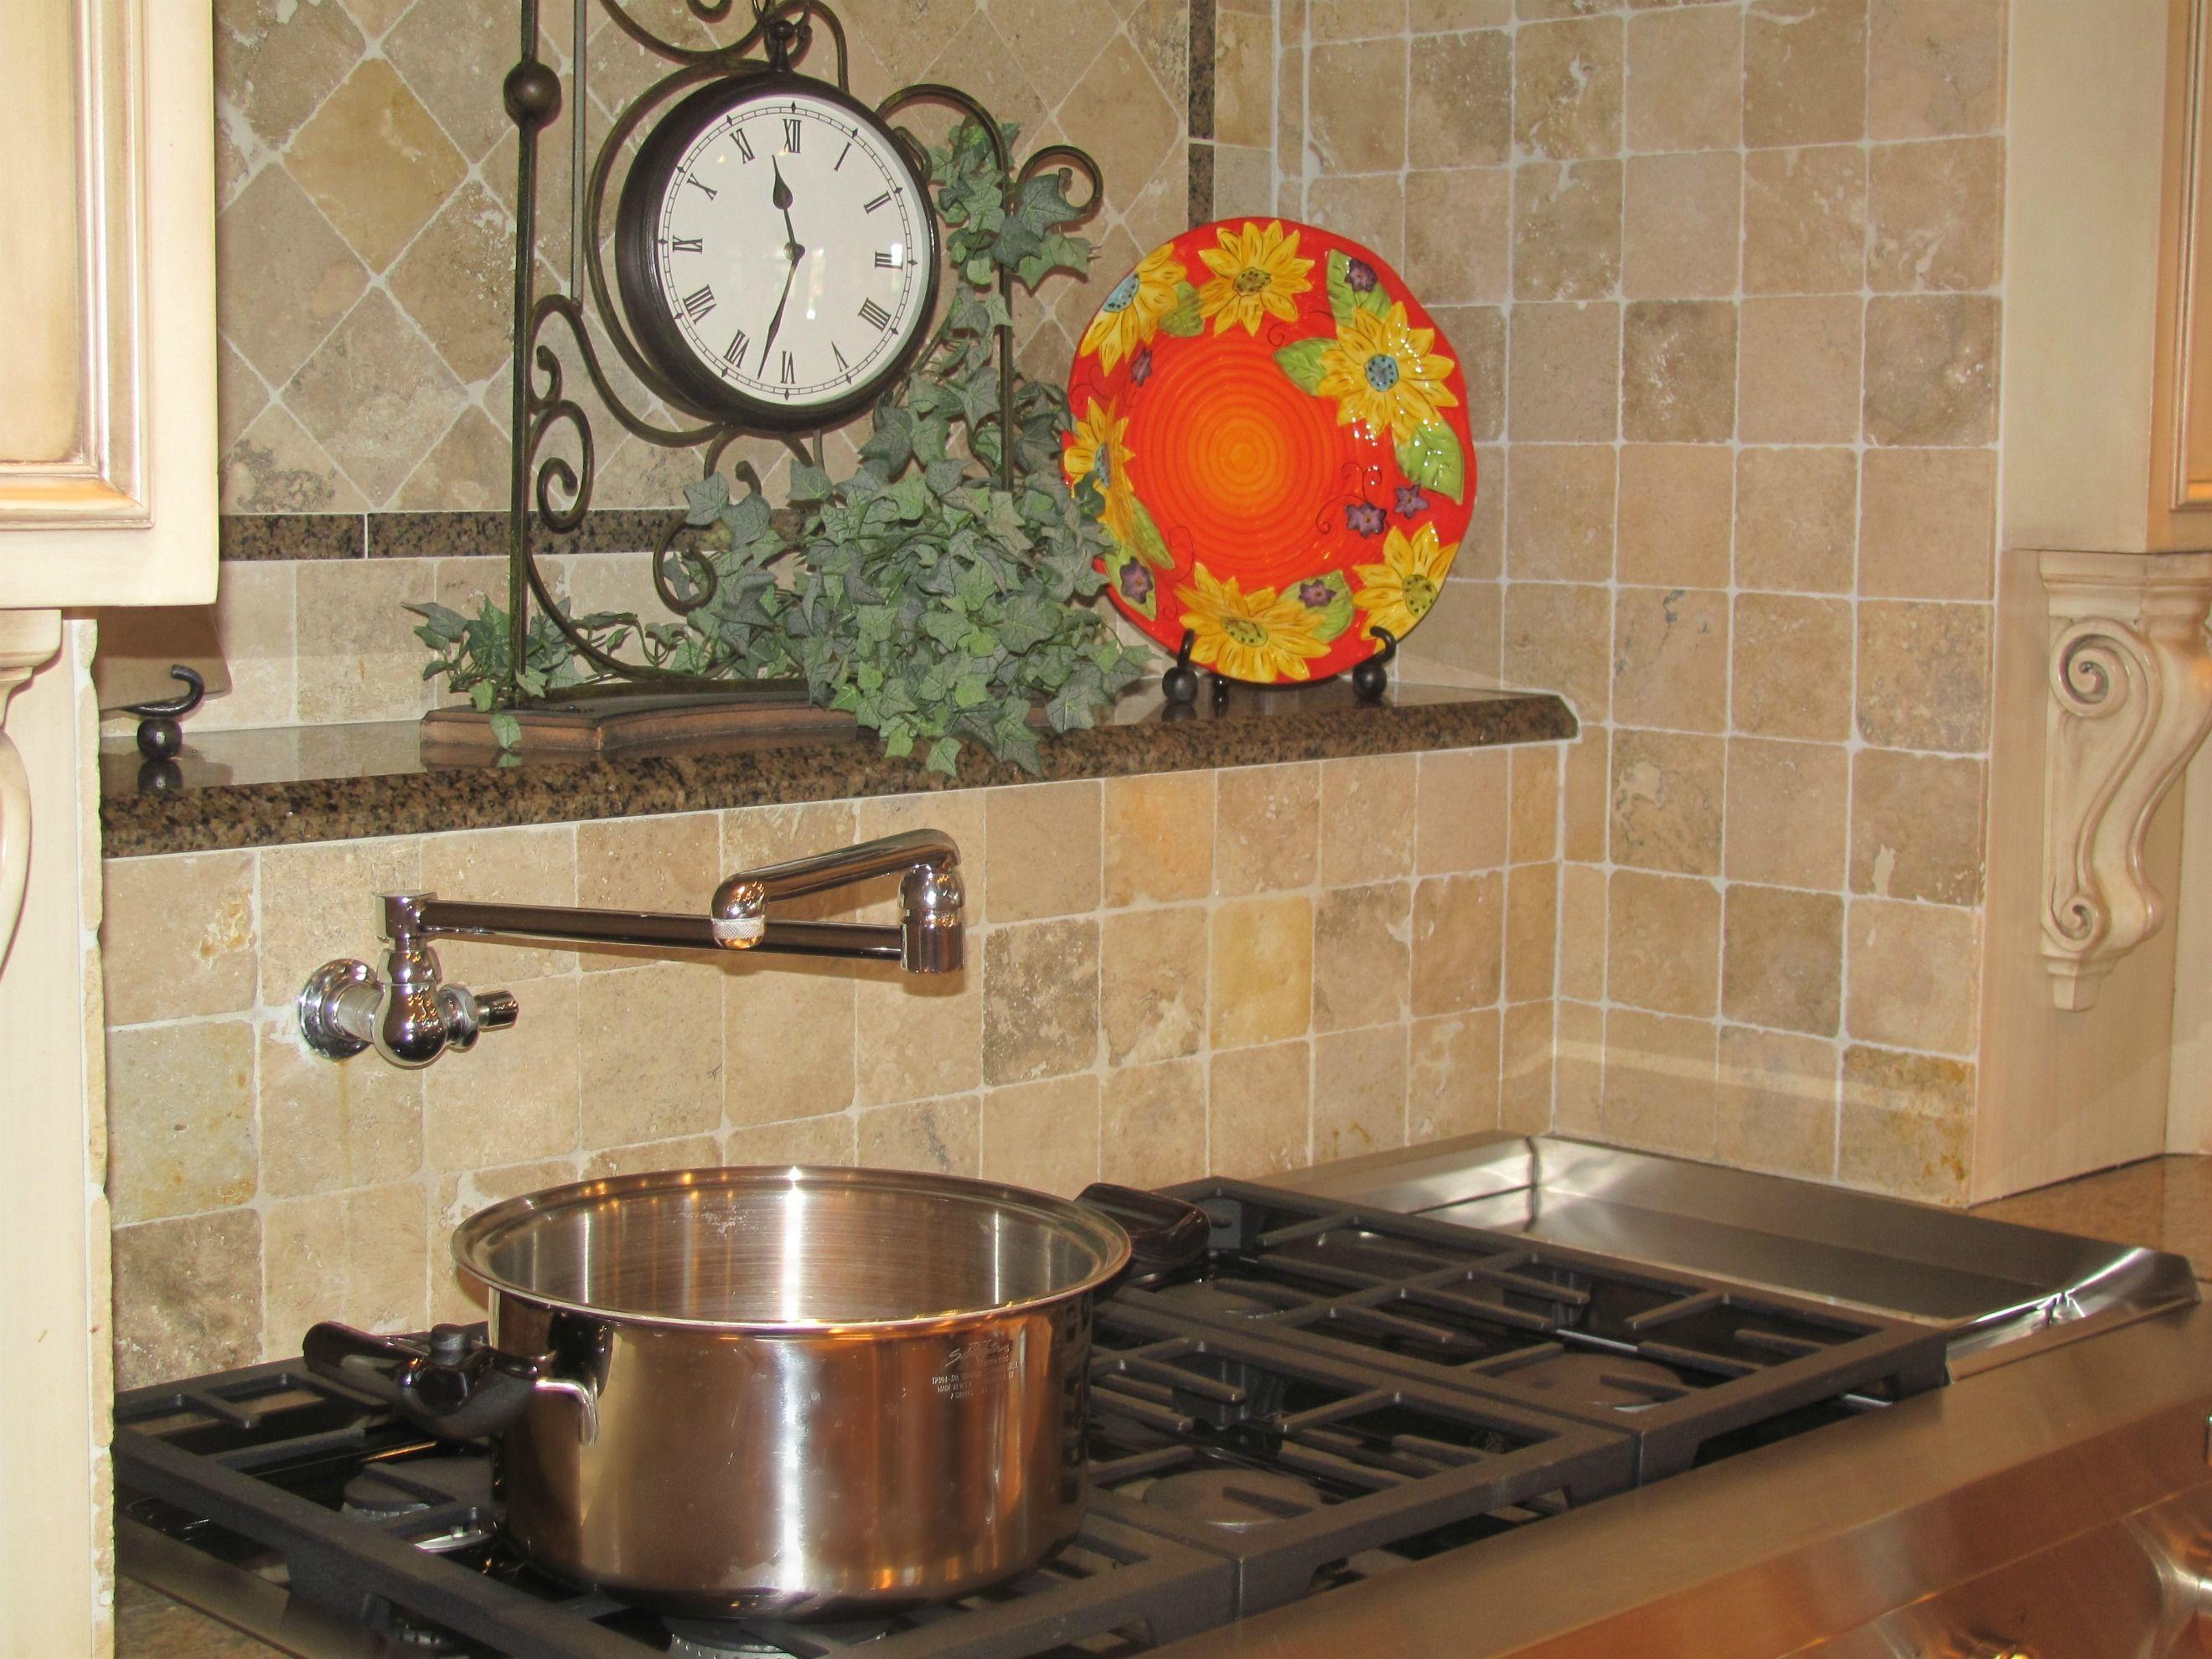 Hot Water Pot Filler Faucet Check more at https://homefurnitureone ...